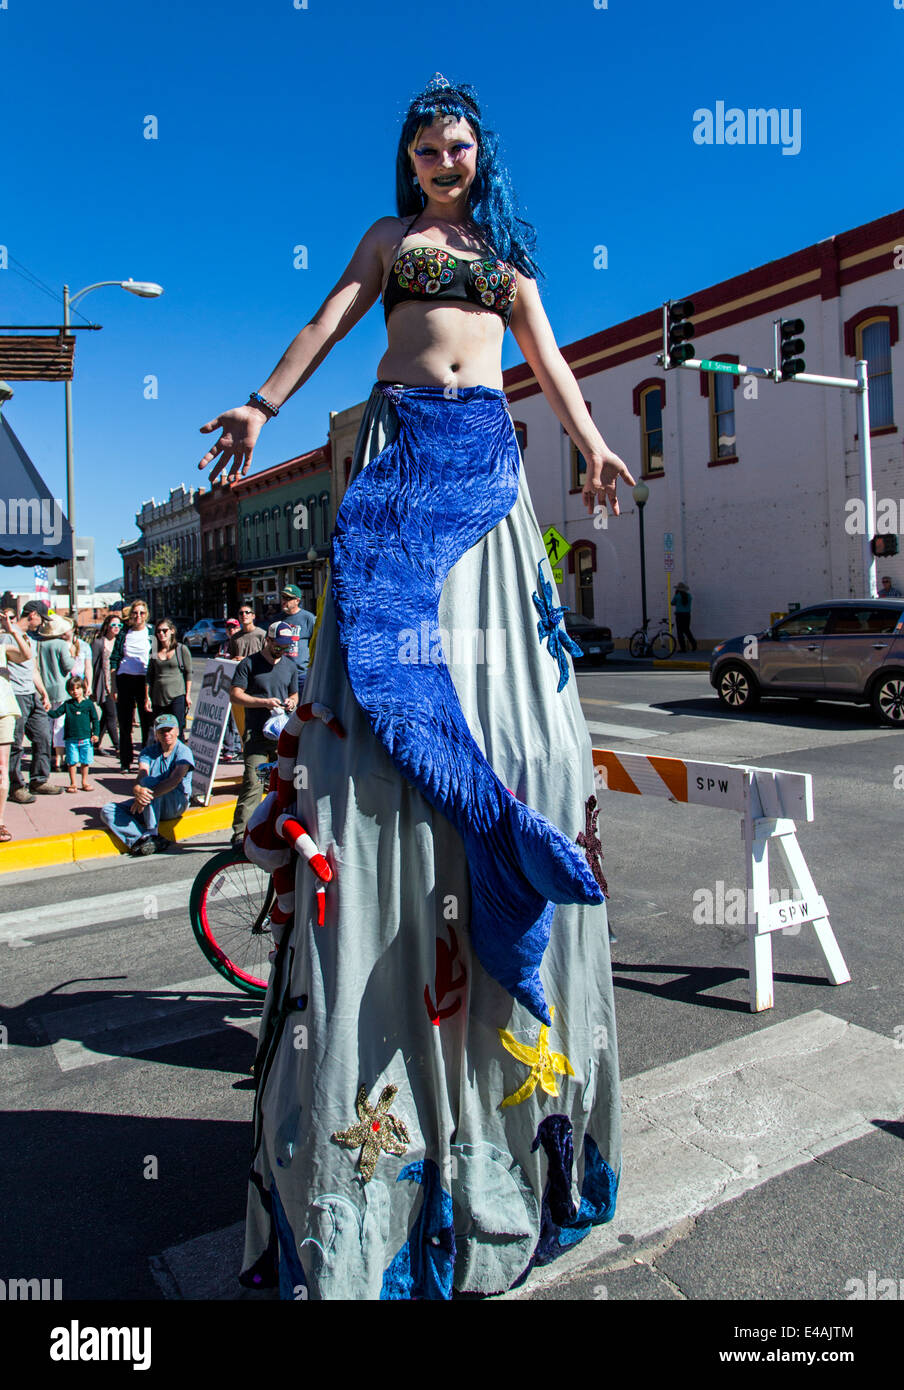 Circus performer on stilts entertain visitors enjoying artwork during the annual small town ArtWalk Festival Stock Photo